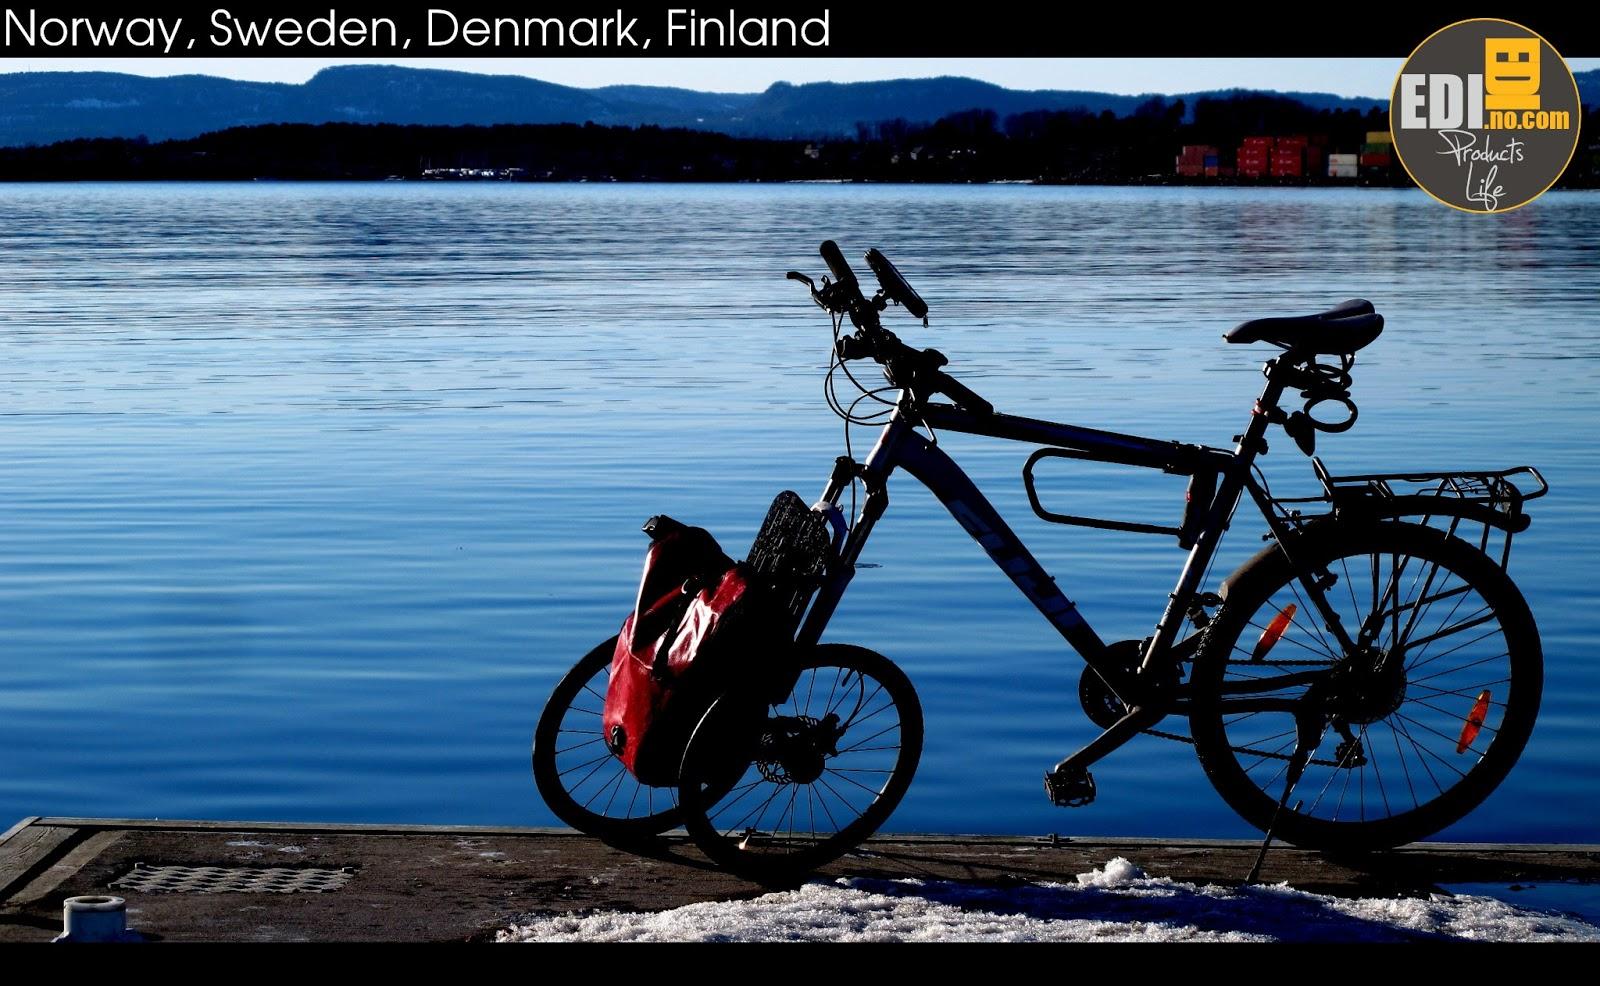 voksen sosiale nettverk suomalainen